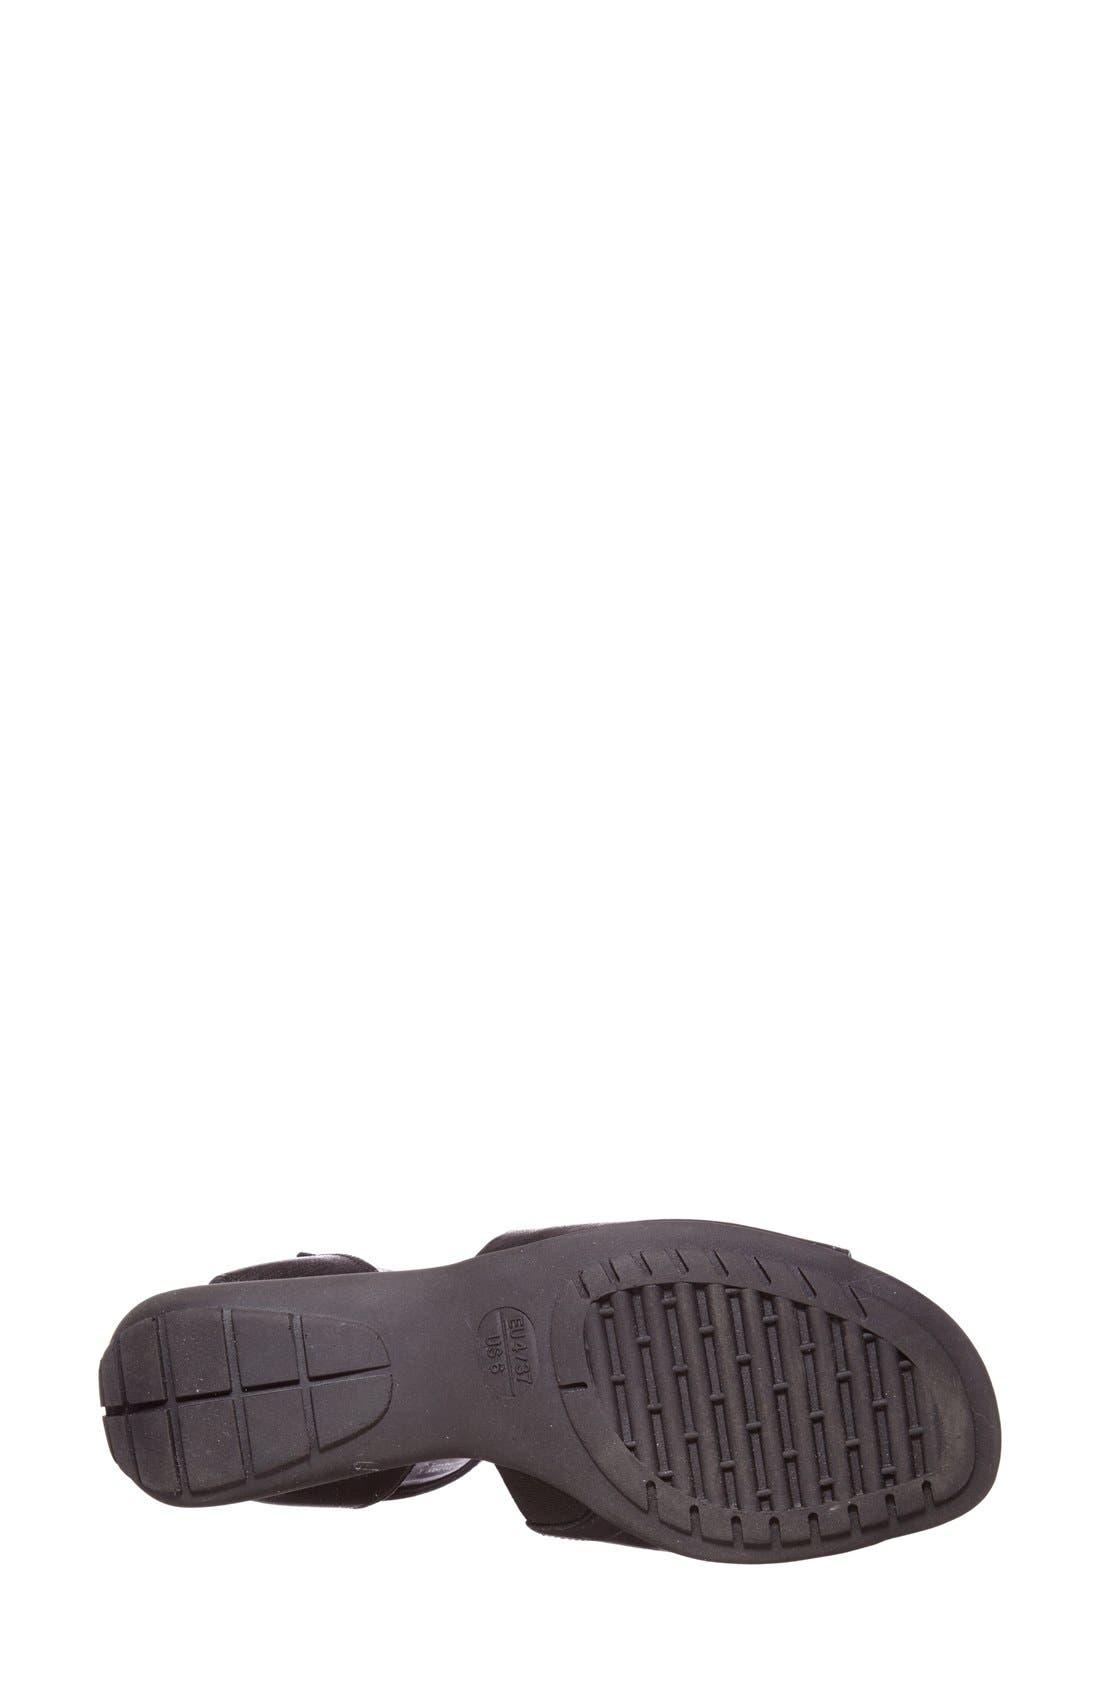 'Beglad' Leather Ankle Strap Sandal,                             Alternate thumbnail 54, color,